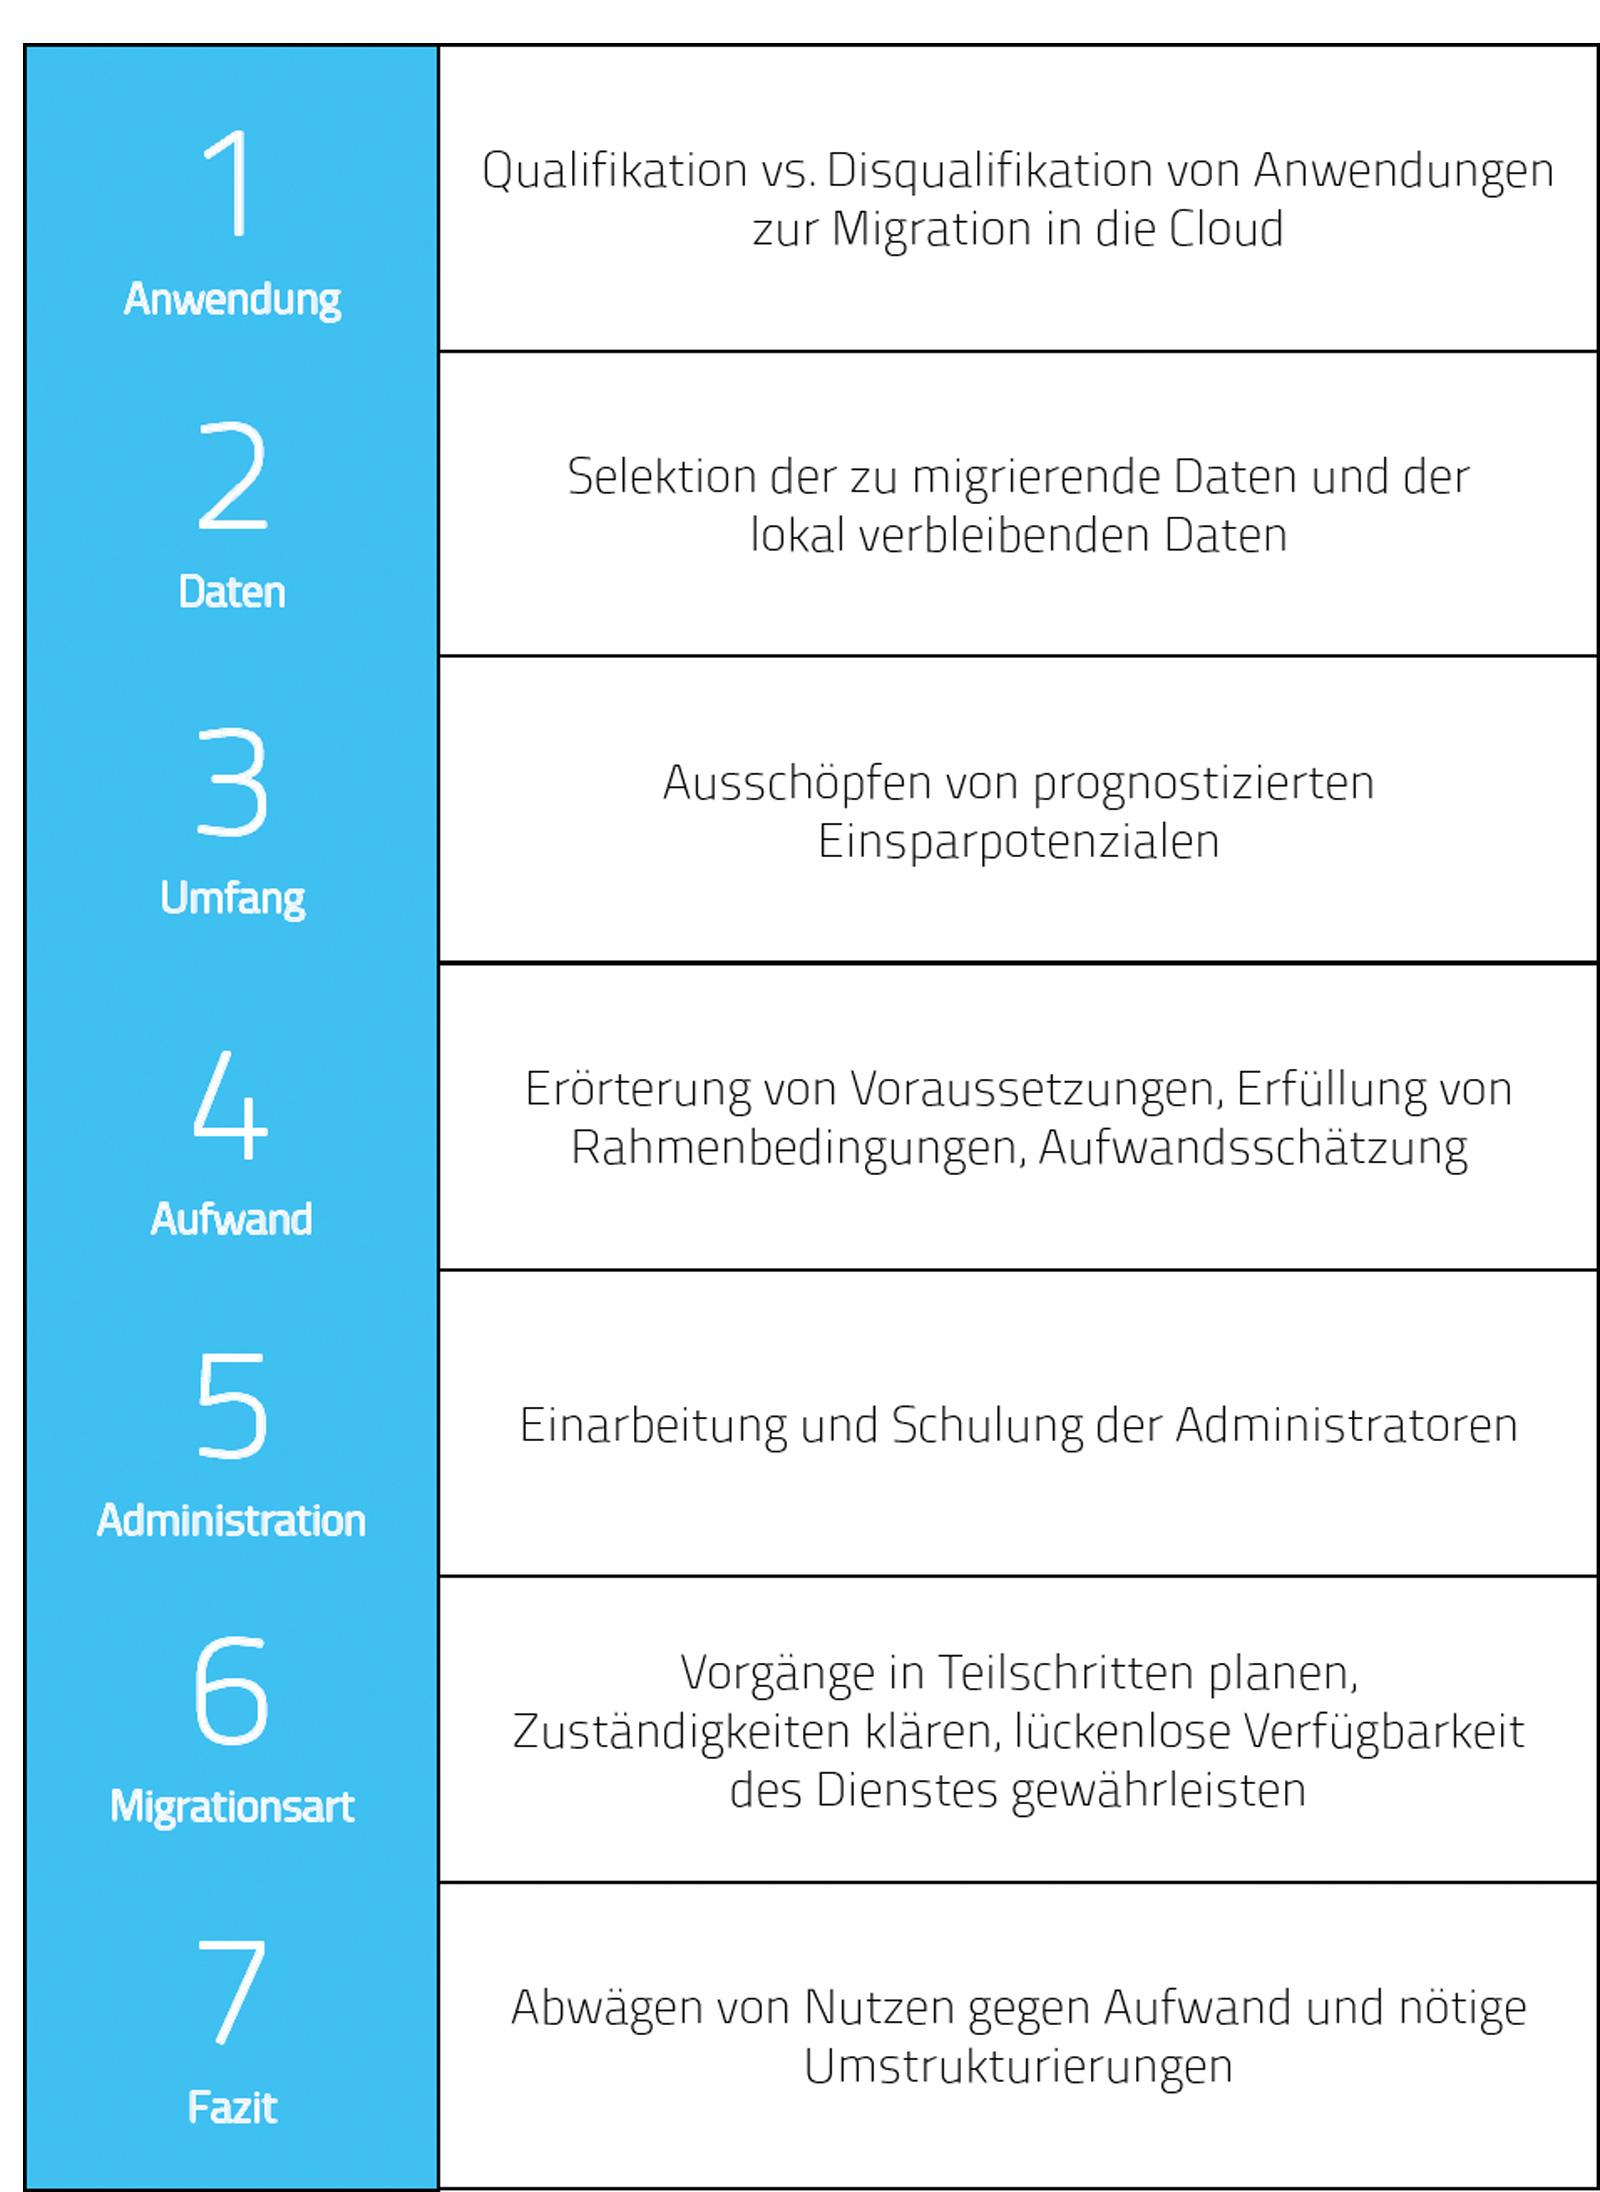 buchmann_onpremise_1.jpg